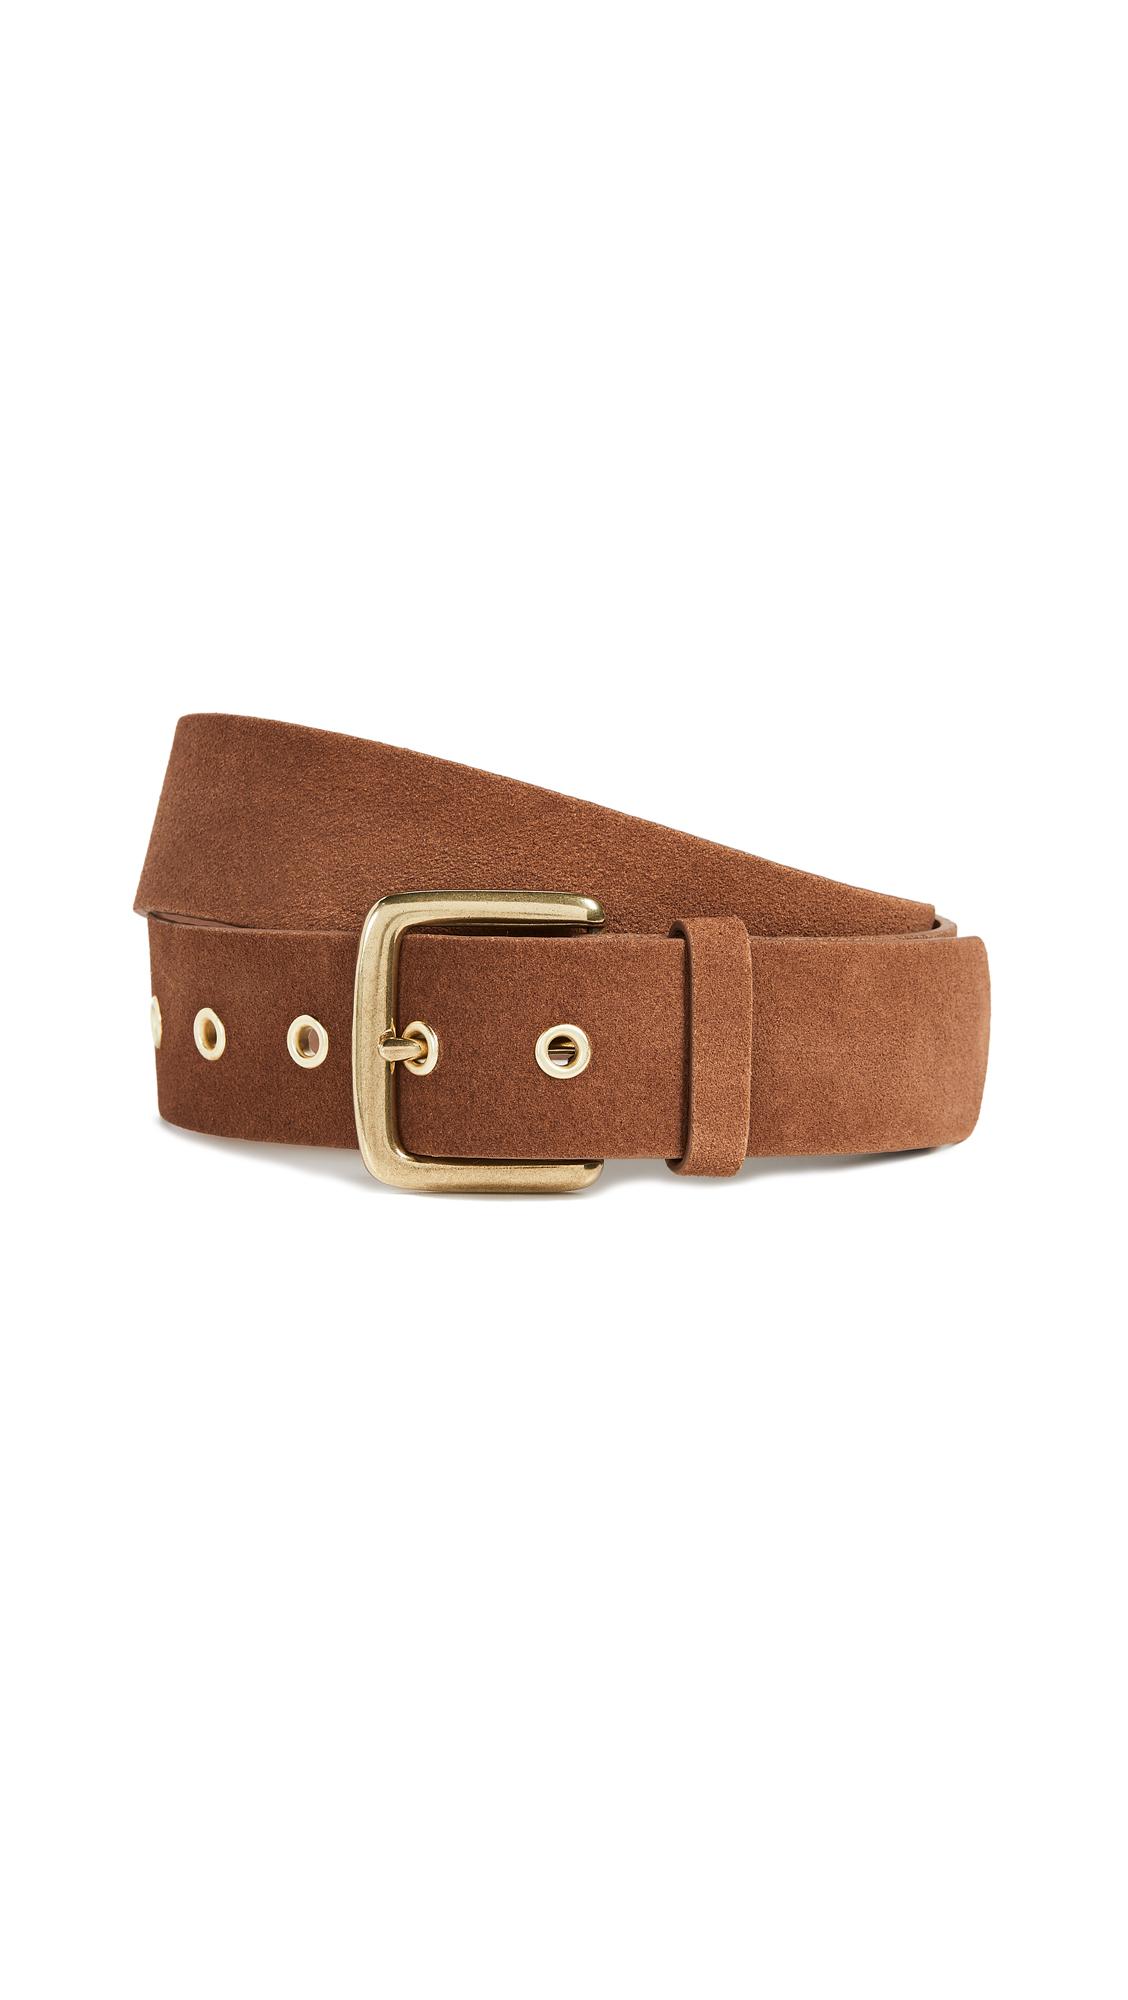 Square-Buckle Leather Grommet Belt in Cognac